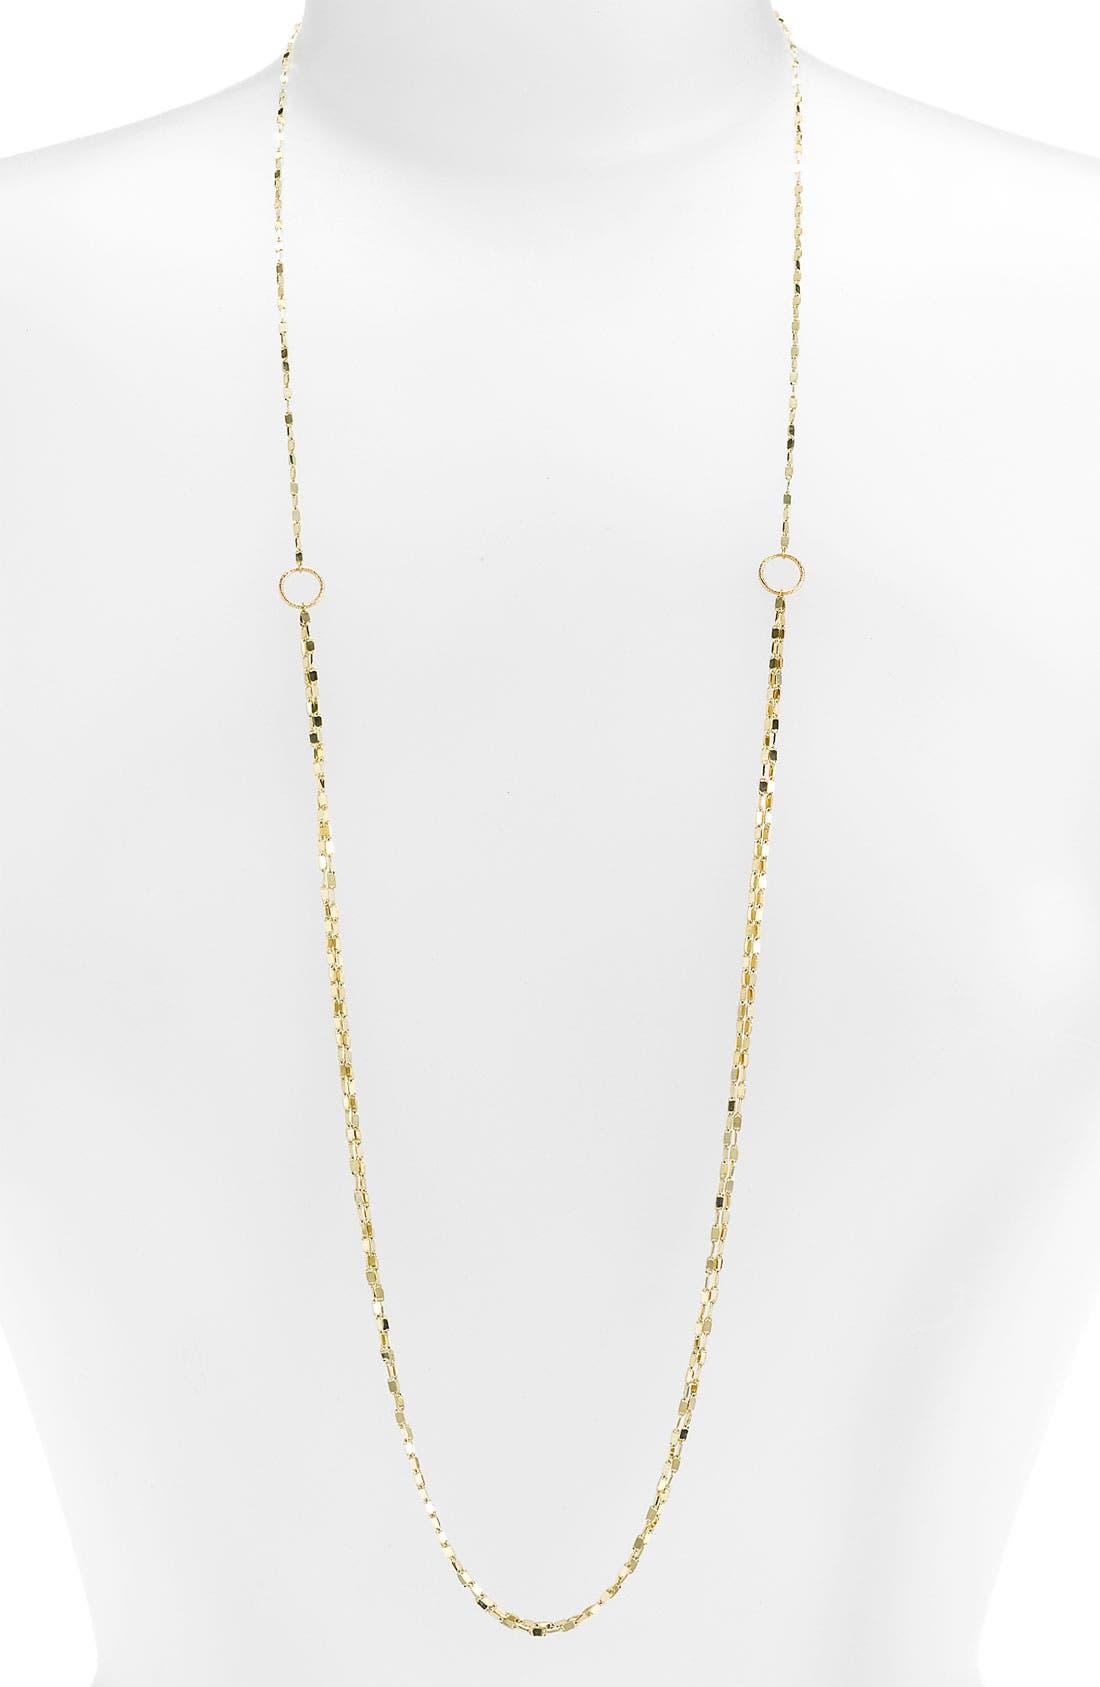 Main Image - Lana Jewelry 'Blake' Layering Necklace